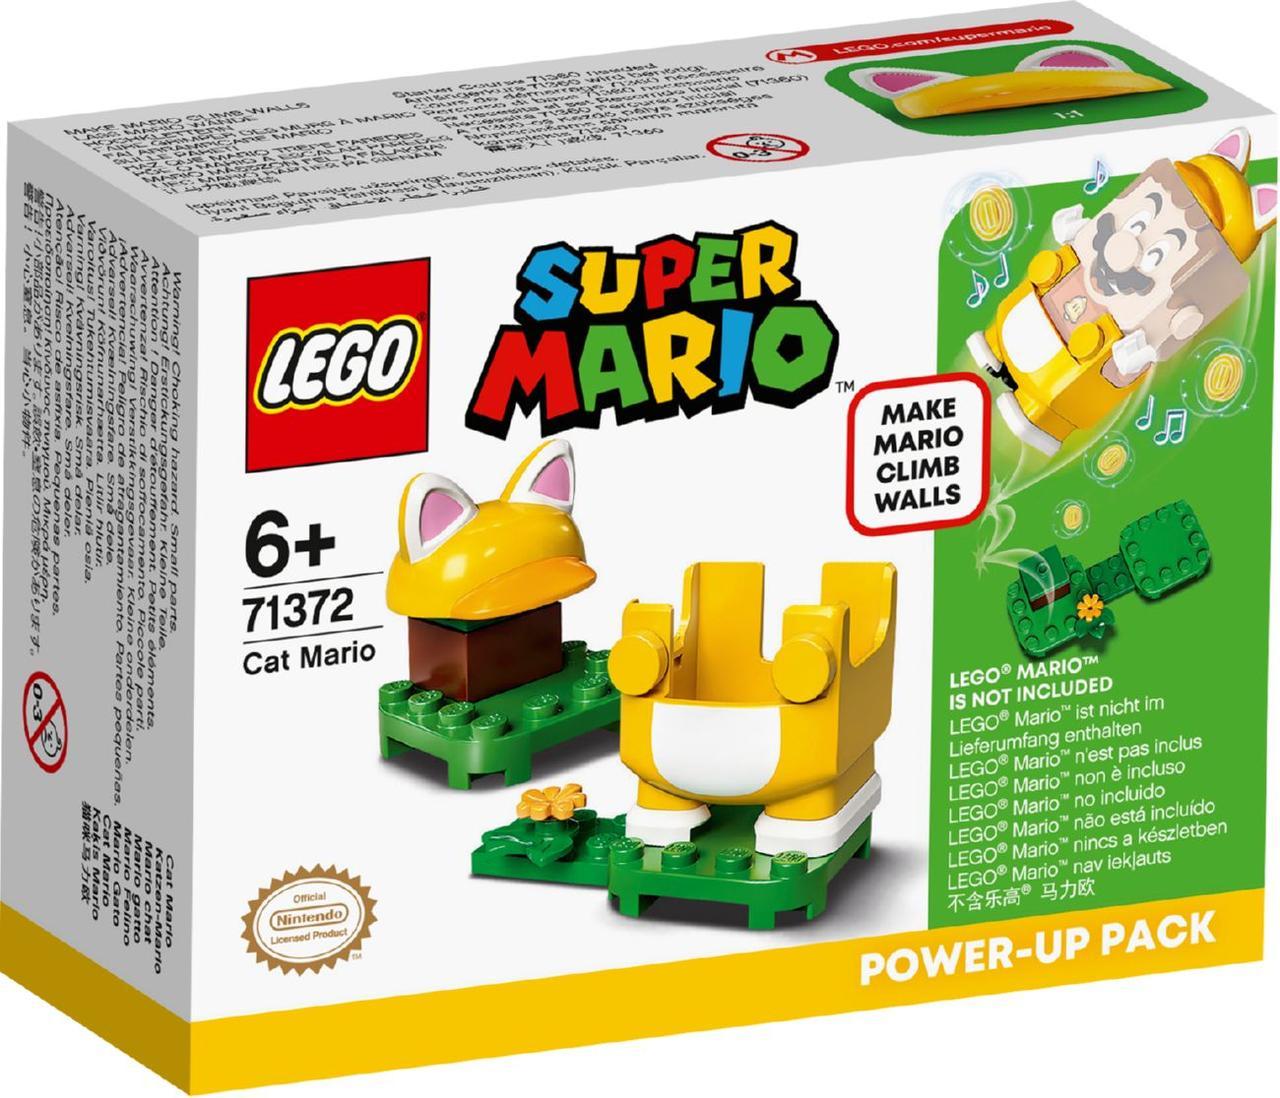 Lego Super Mario Марио-кот. Набор усилений 71372